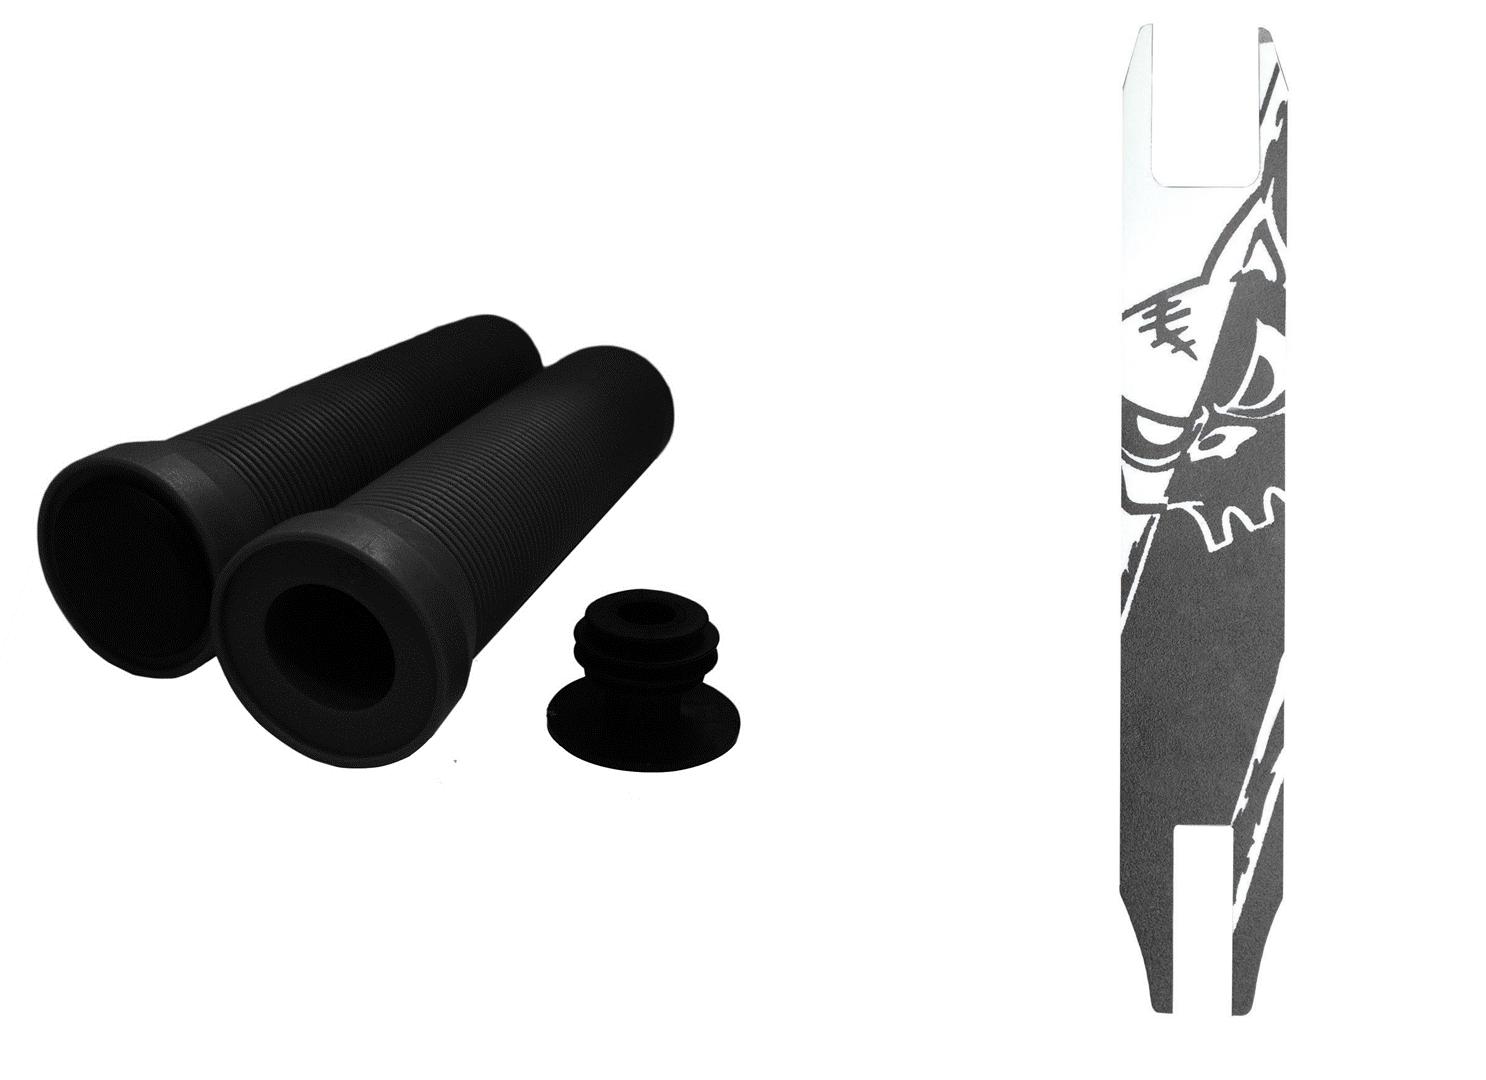 Schwarz /& Weiß Griffband Kombo Team Dogz Kickboard Lenkergriffe Schwarz